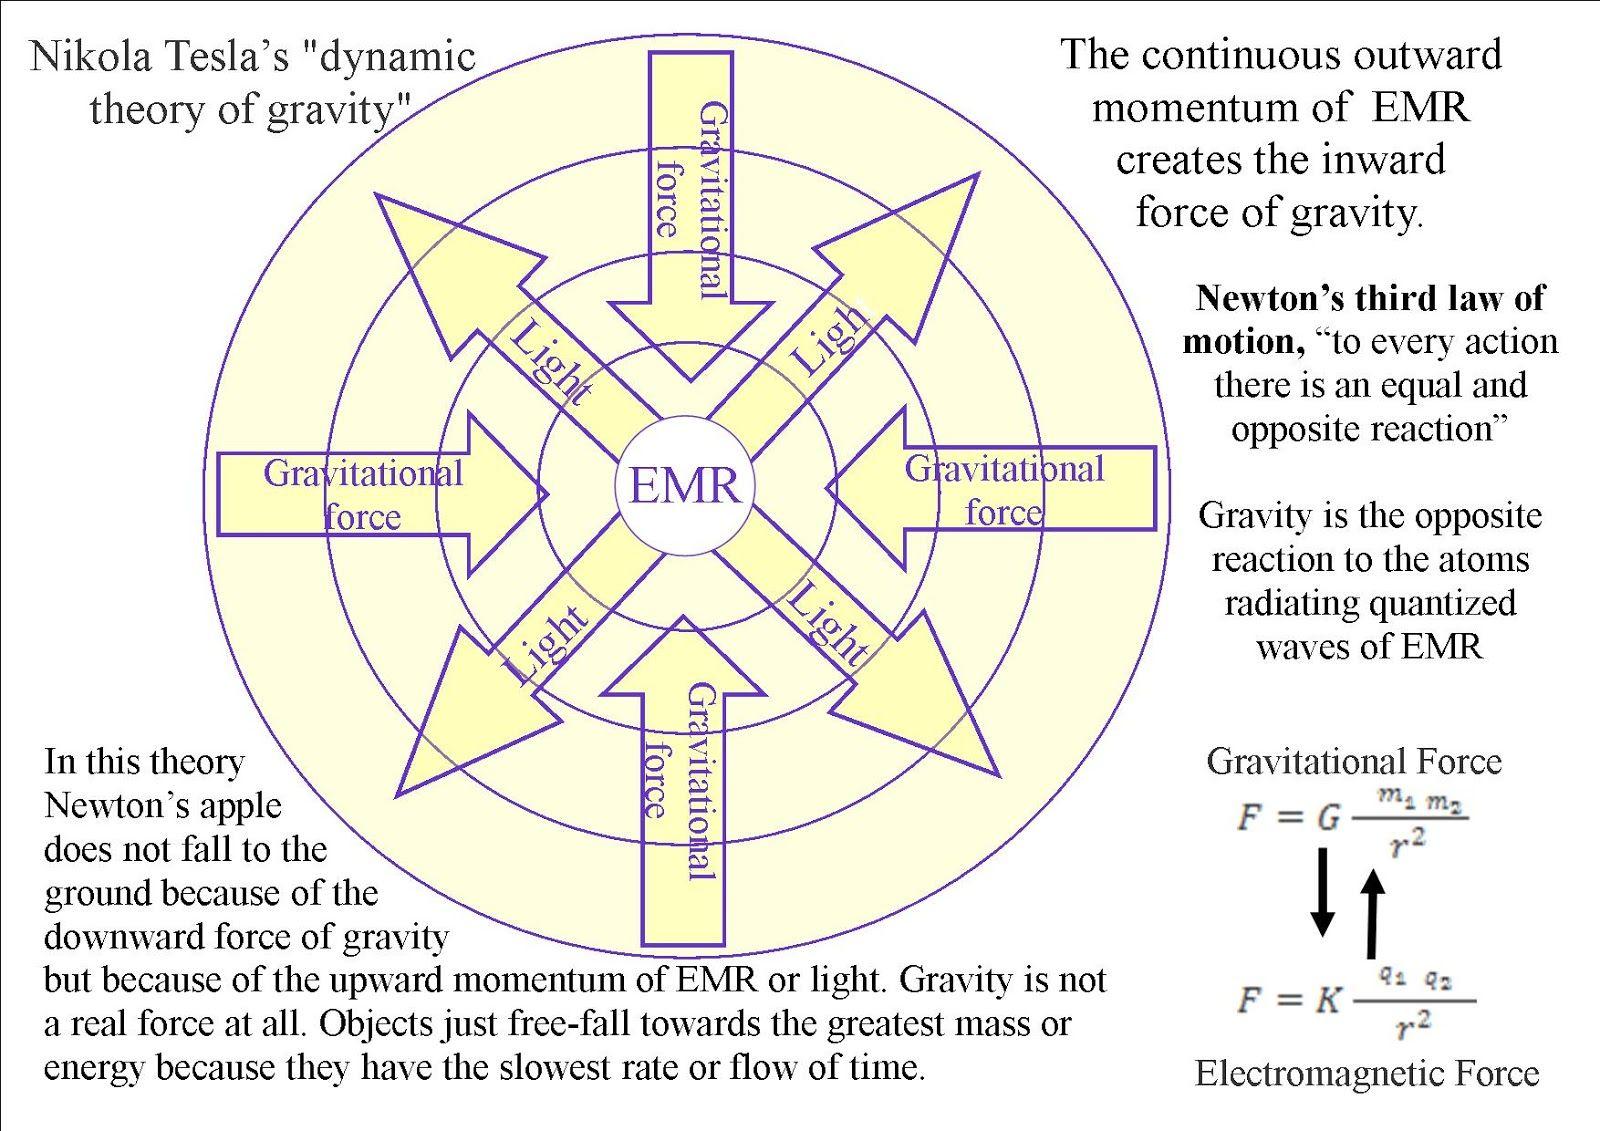 [Image: EMR+sphere+gravity+4.jpg]